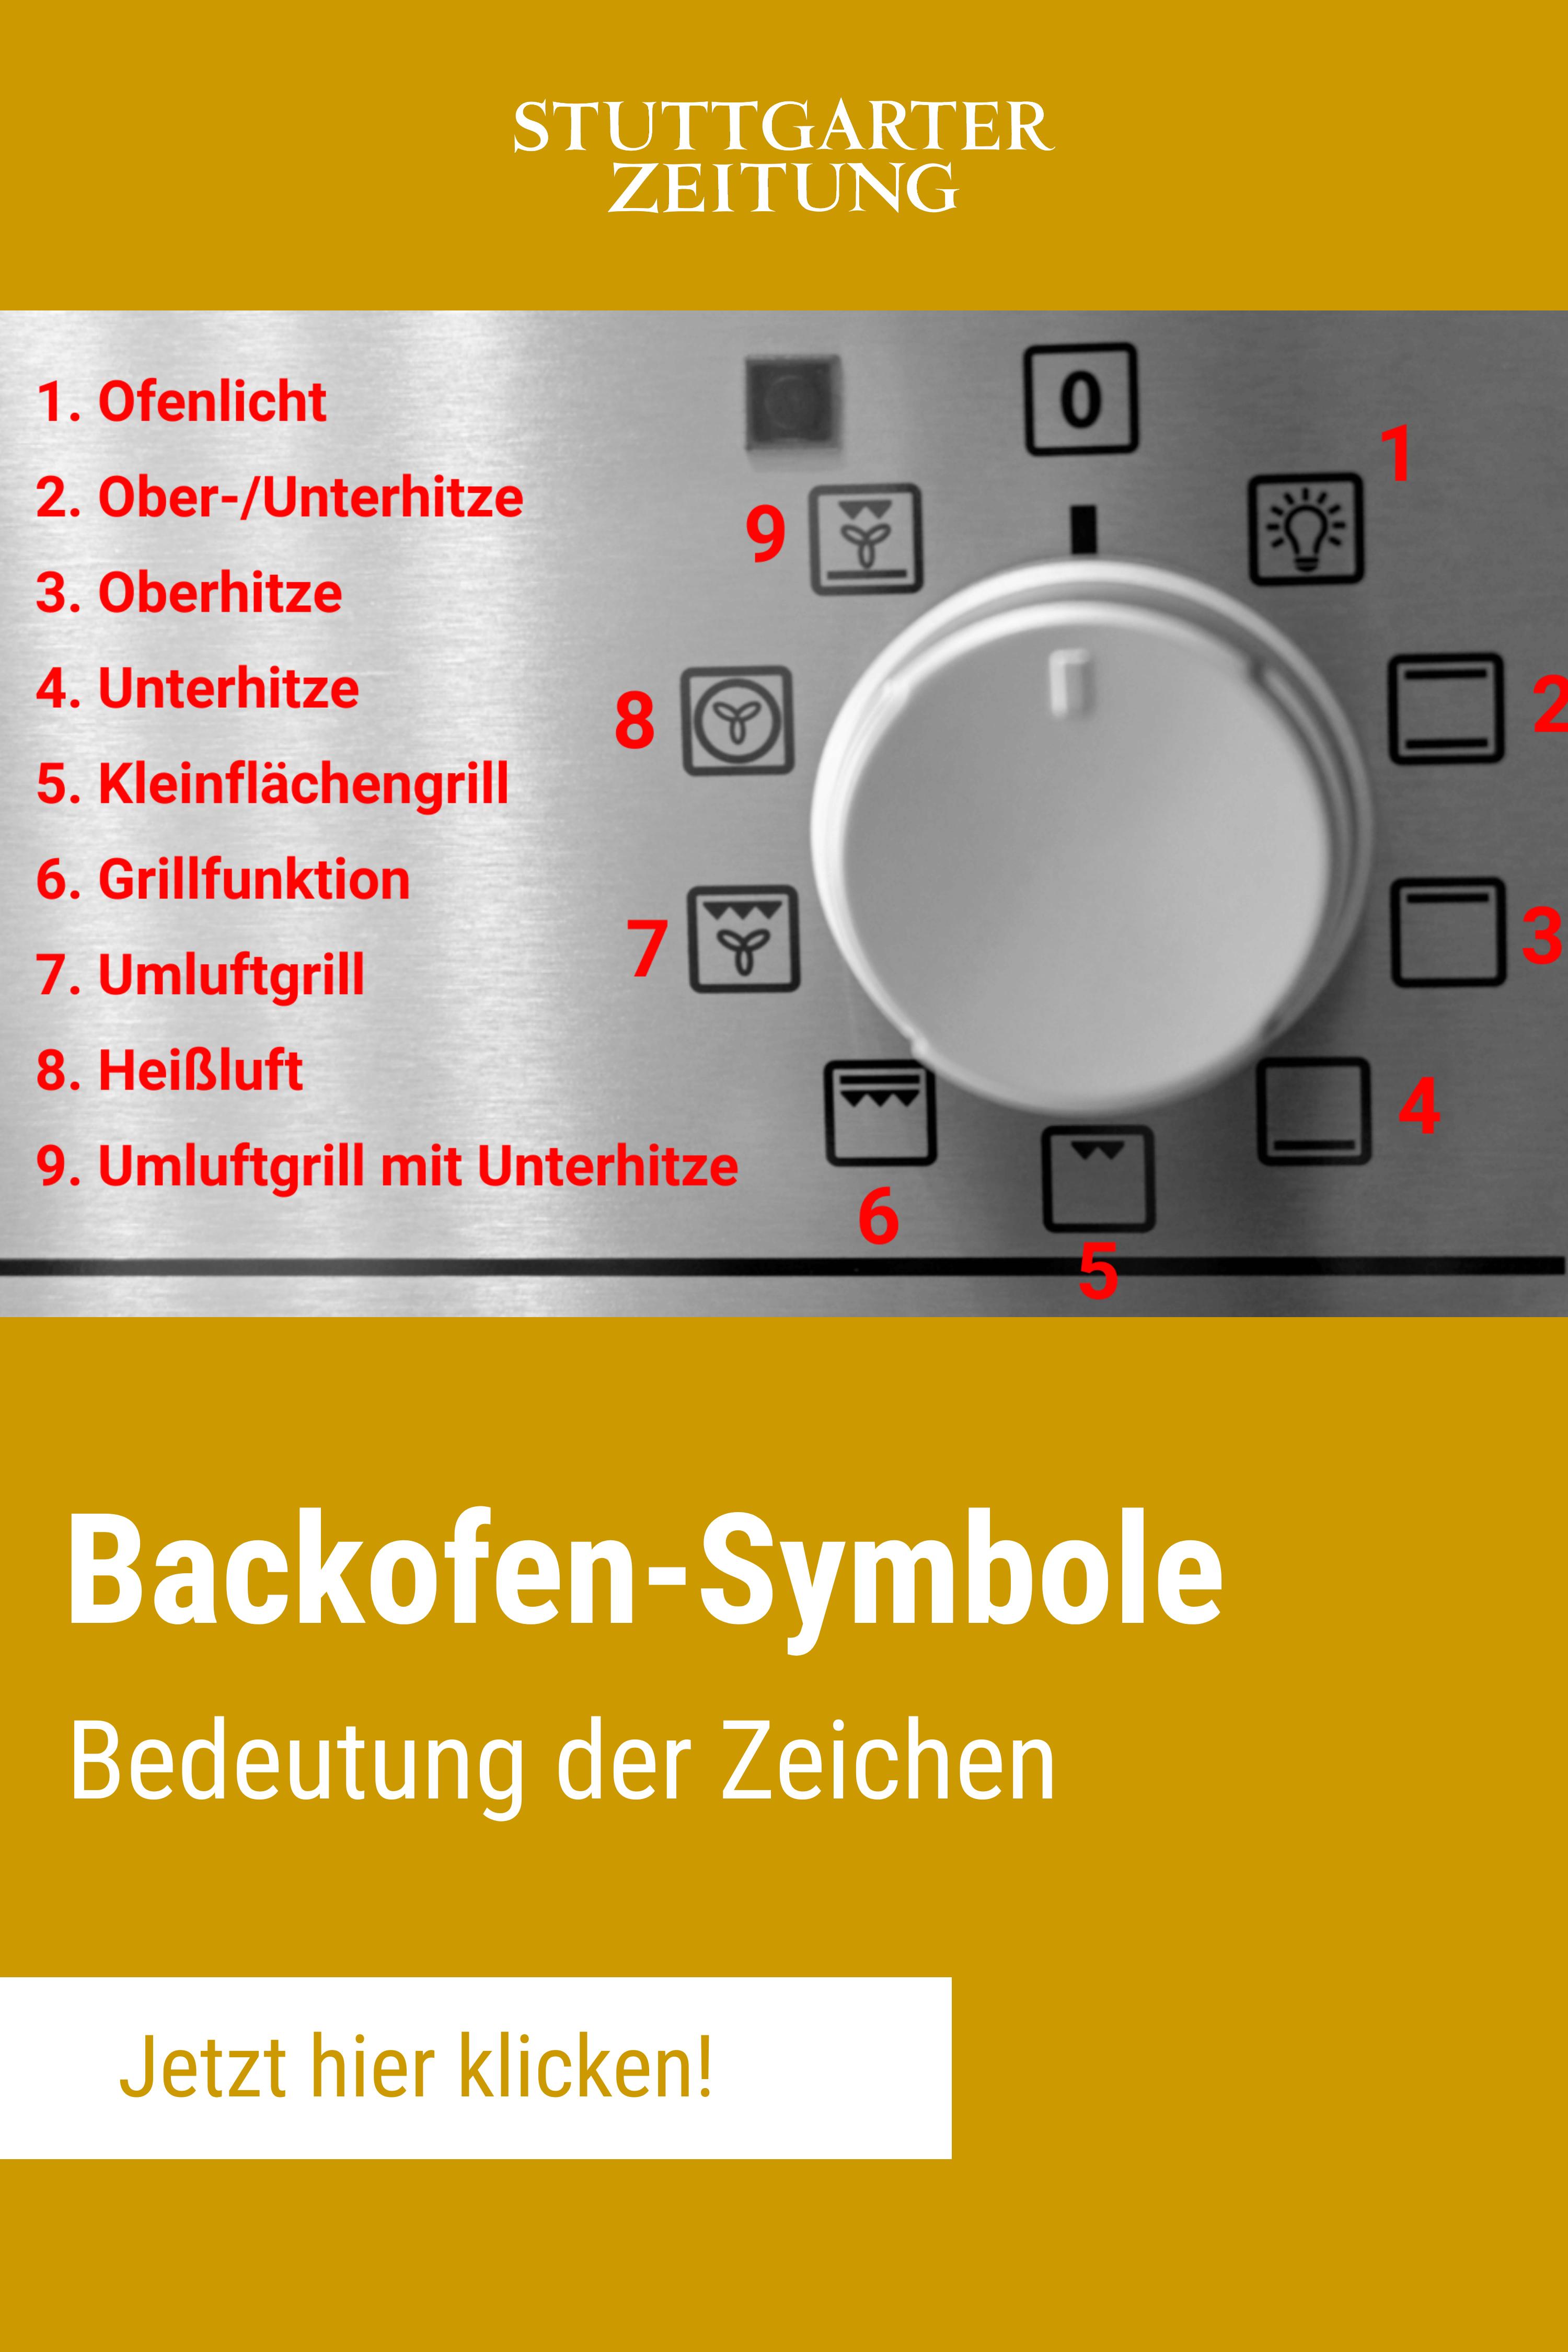 Symbole die was bedeuten Mobilfunk Empfang